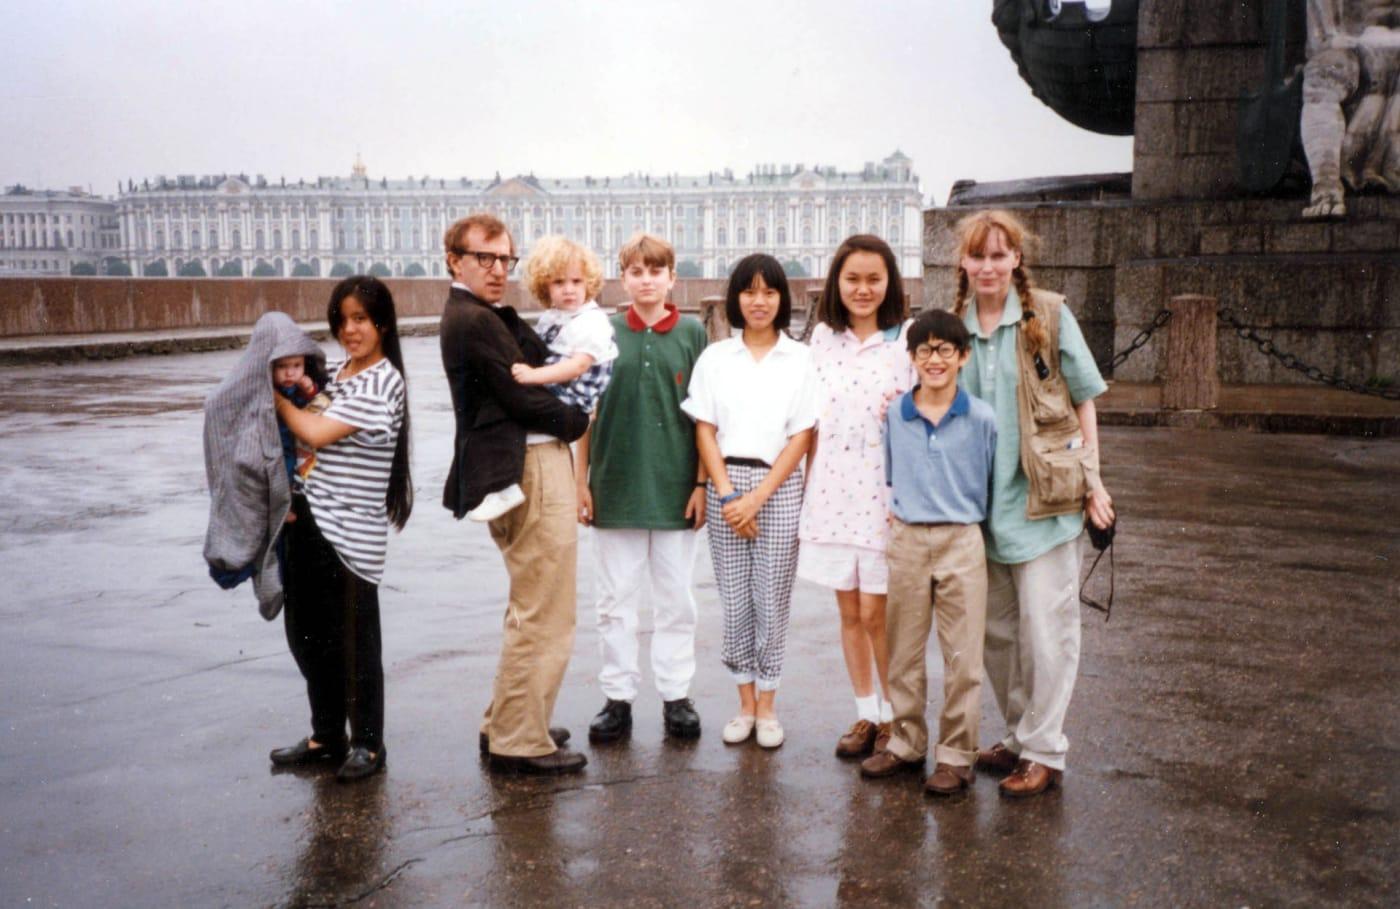 Woody Allen, Mia Farrow, and their children